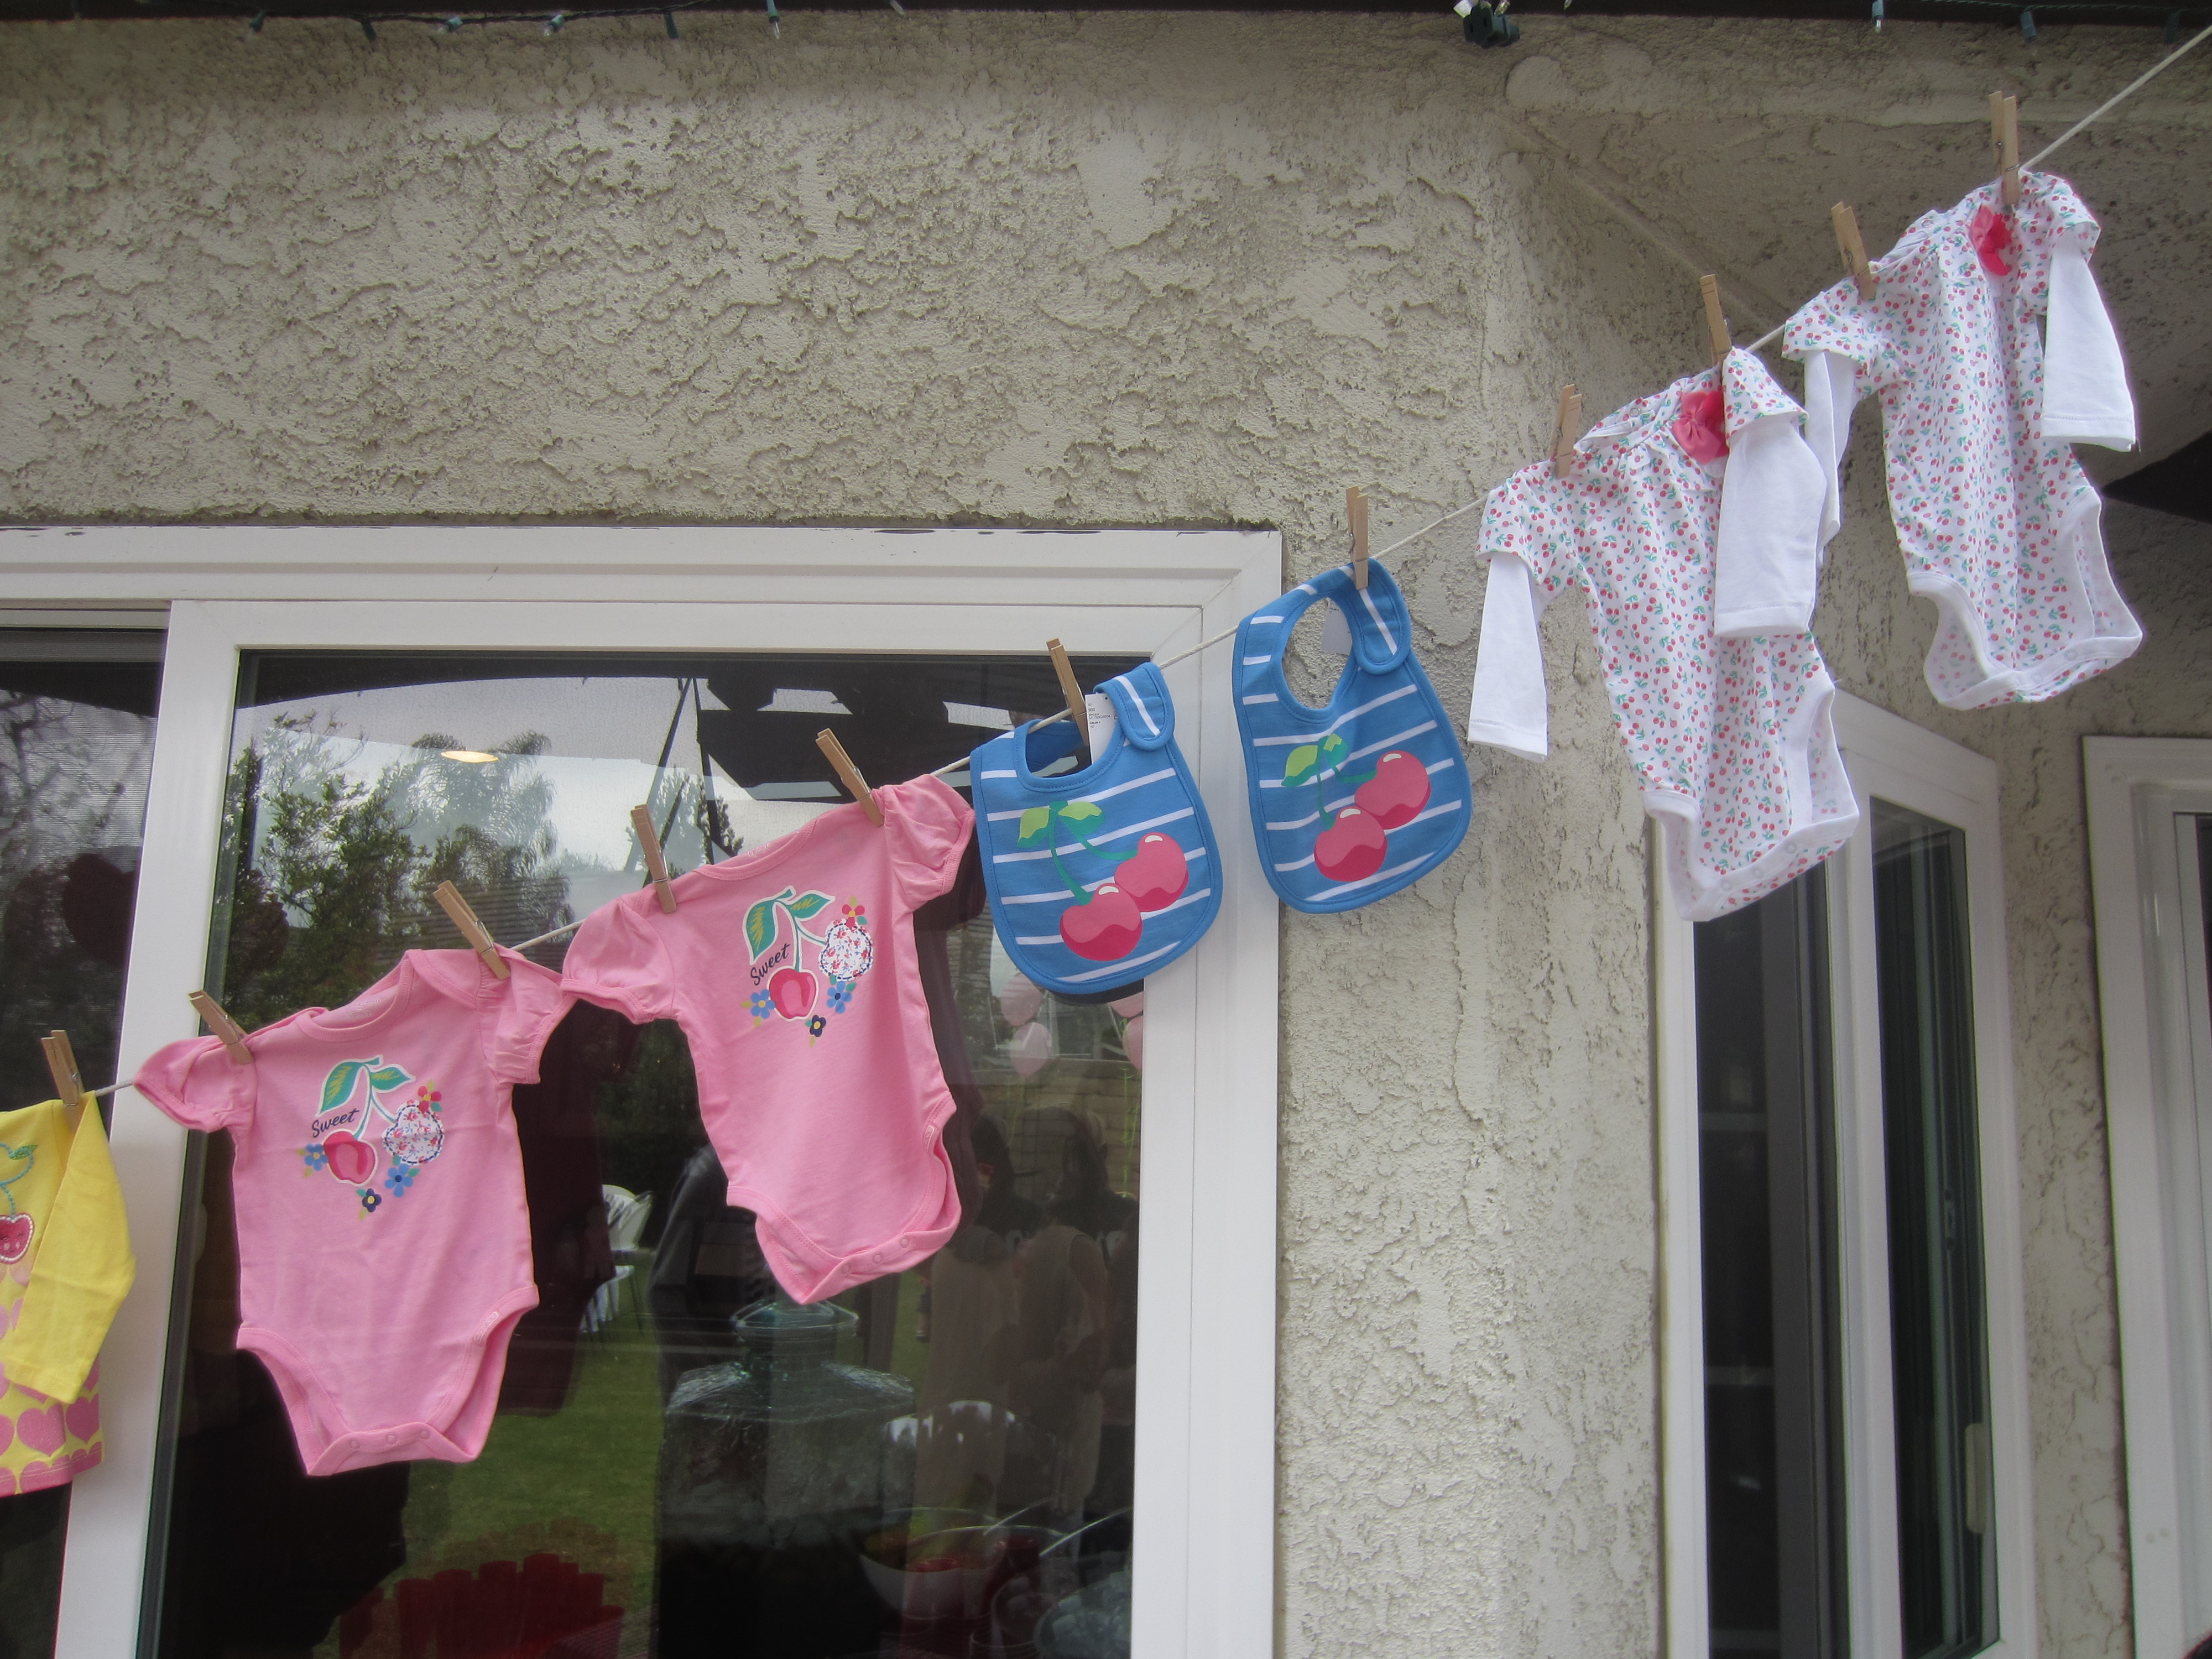 Cherry Themed Twin Baby Shower - DIY Inspired